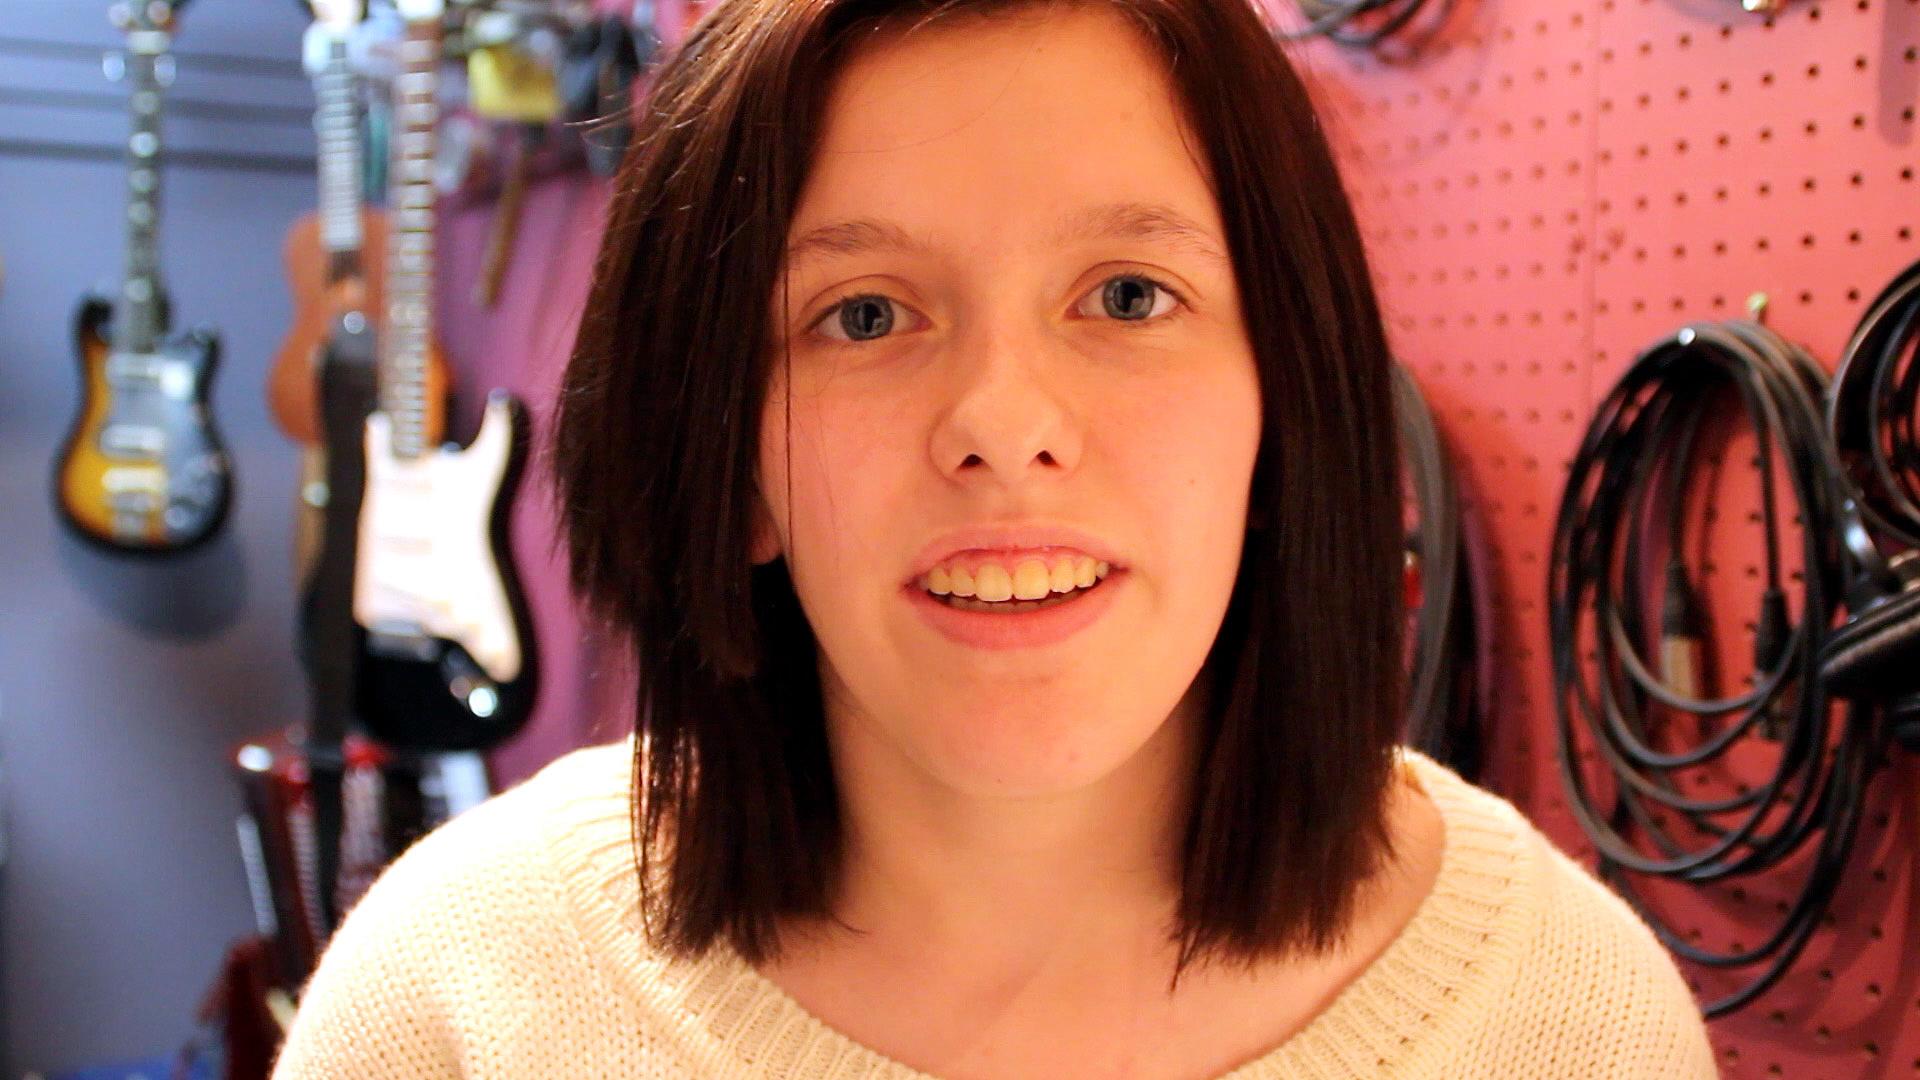 Bridget, the narrator on Scratch Tracks